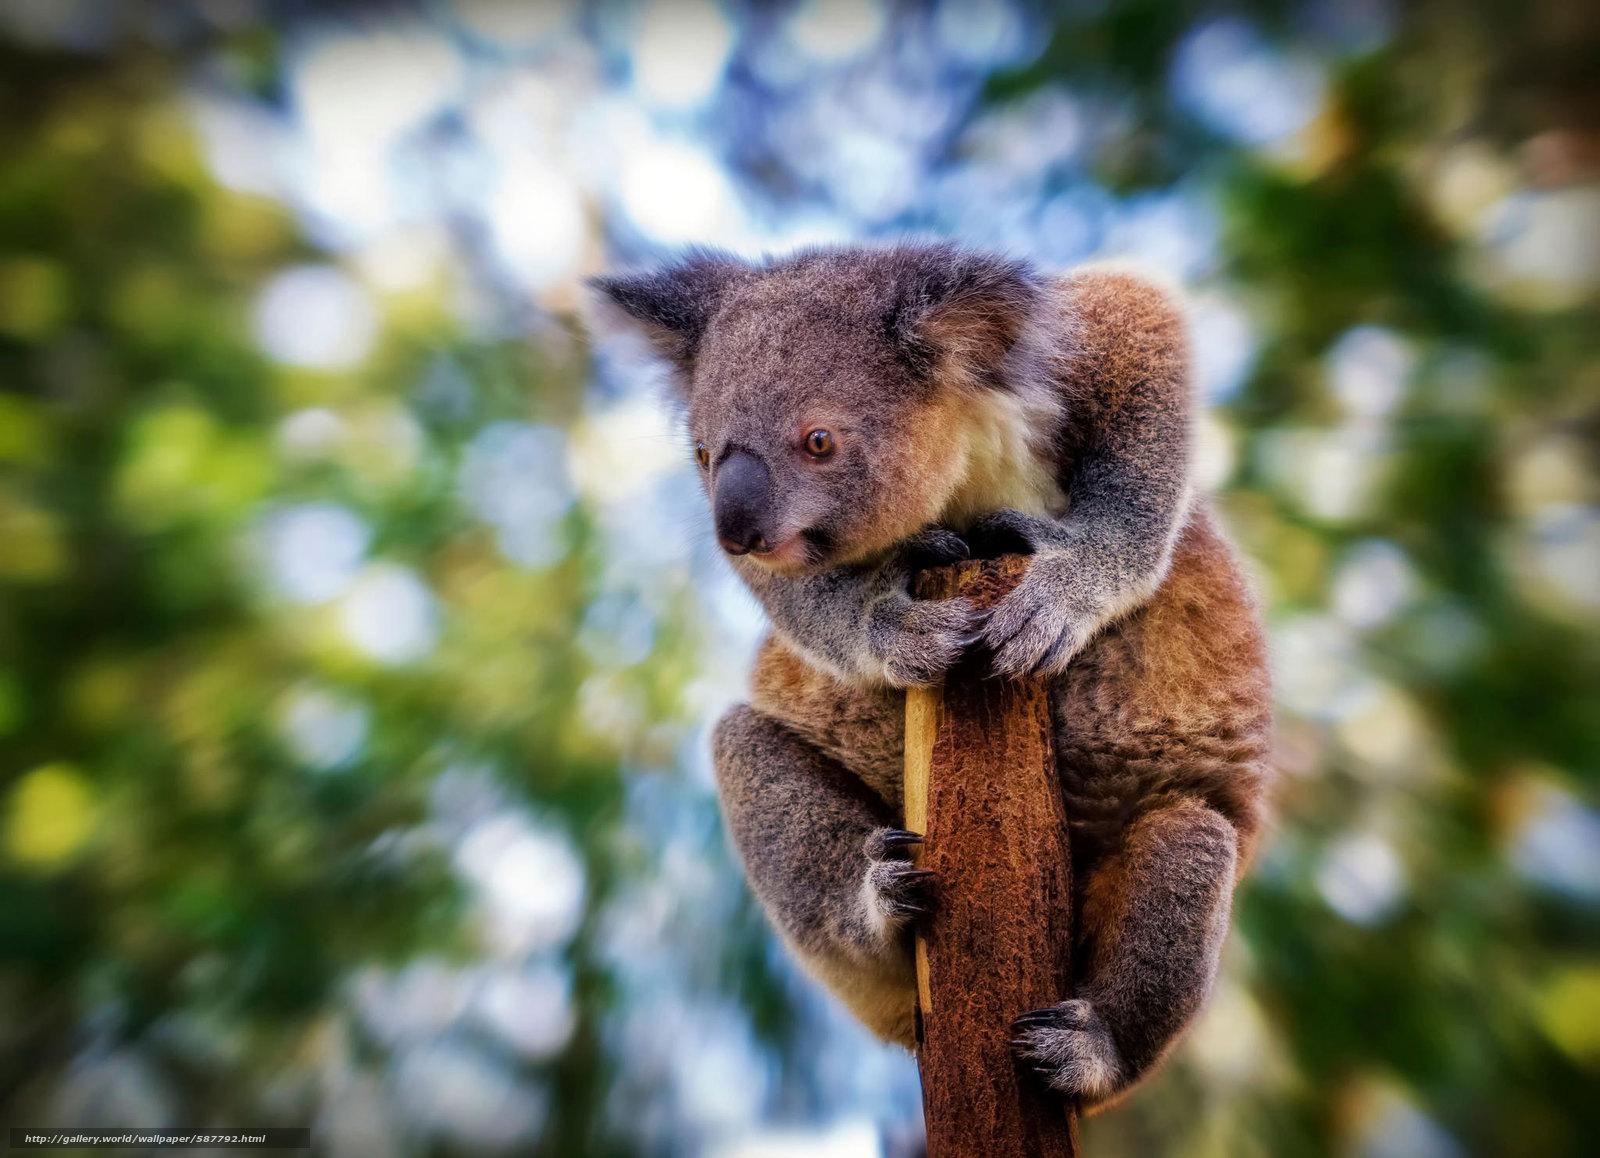 Download wallpaper view,  koala,  degradation free desktop wallpaper in the resolution 2048x1482 — picture №587792